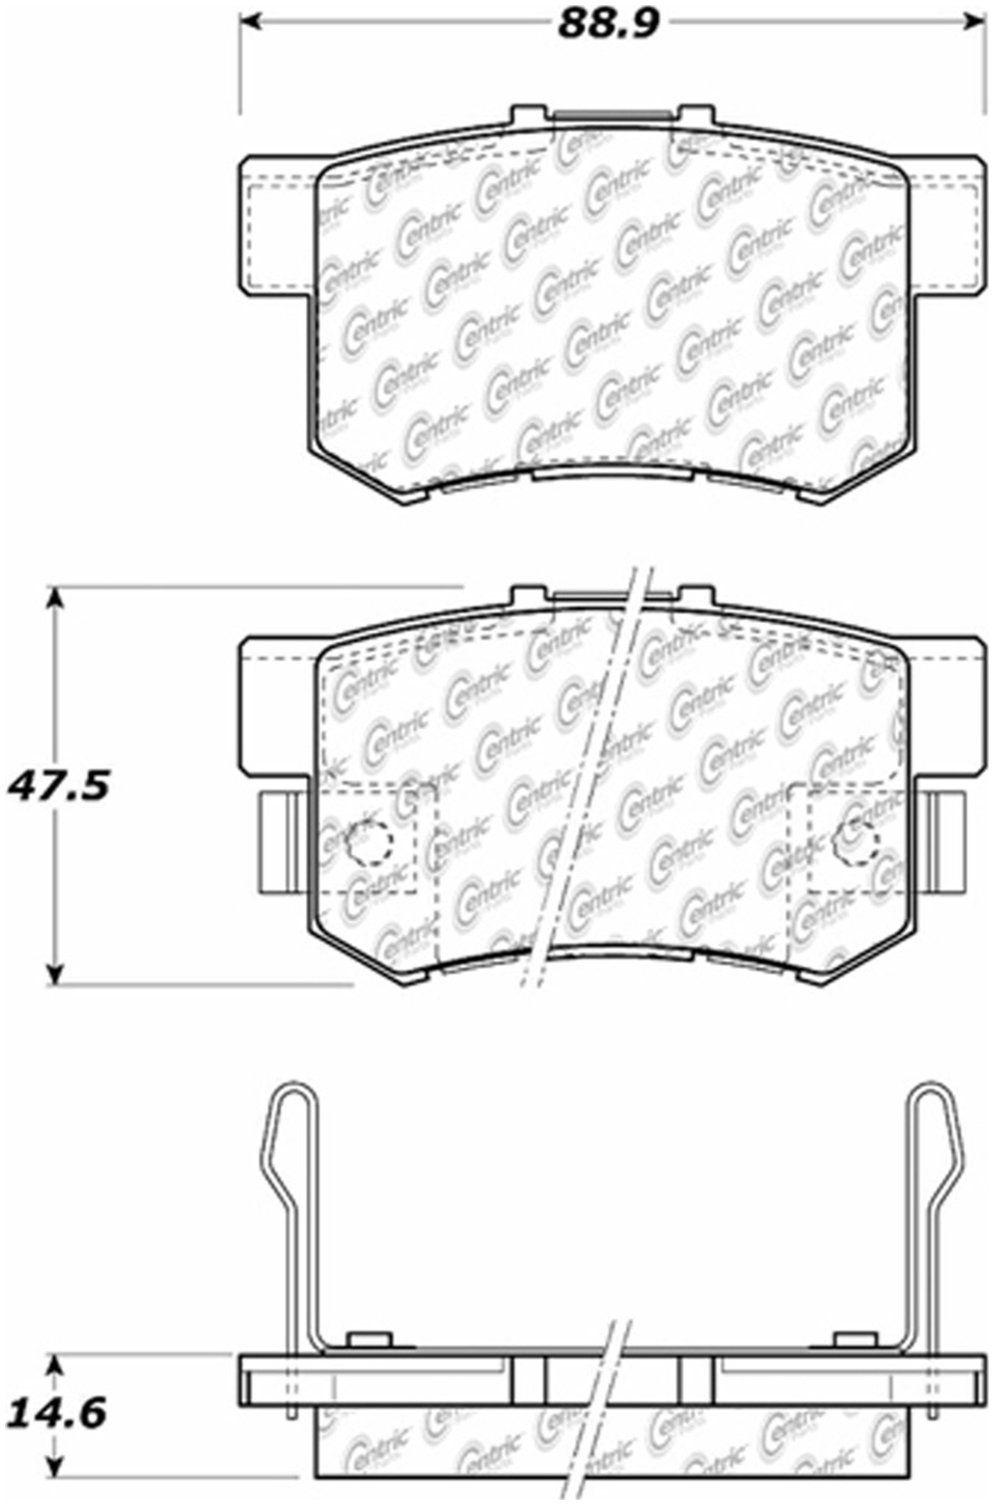 4d56 engine schematic diagram of transmission wiring. Black Bedroom Furniture Sets. Home Design Ideas